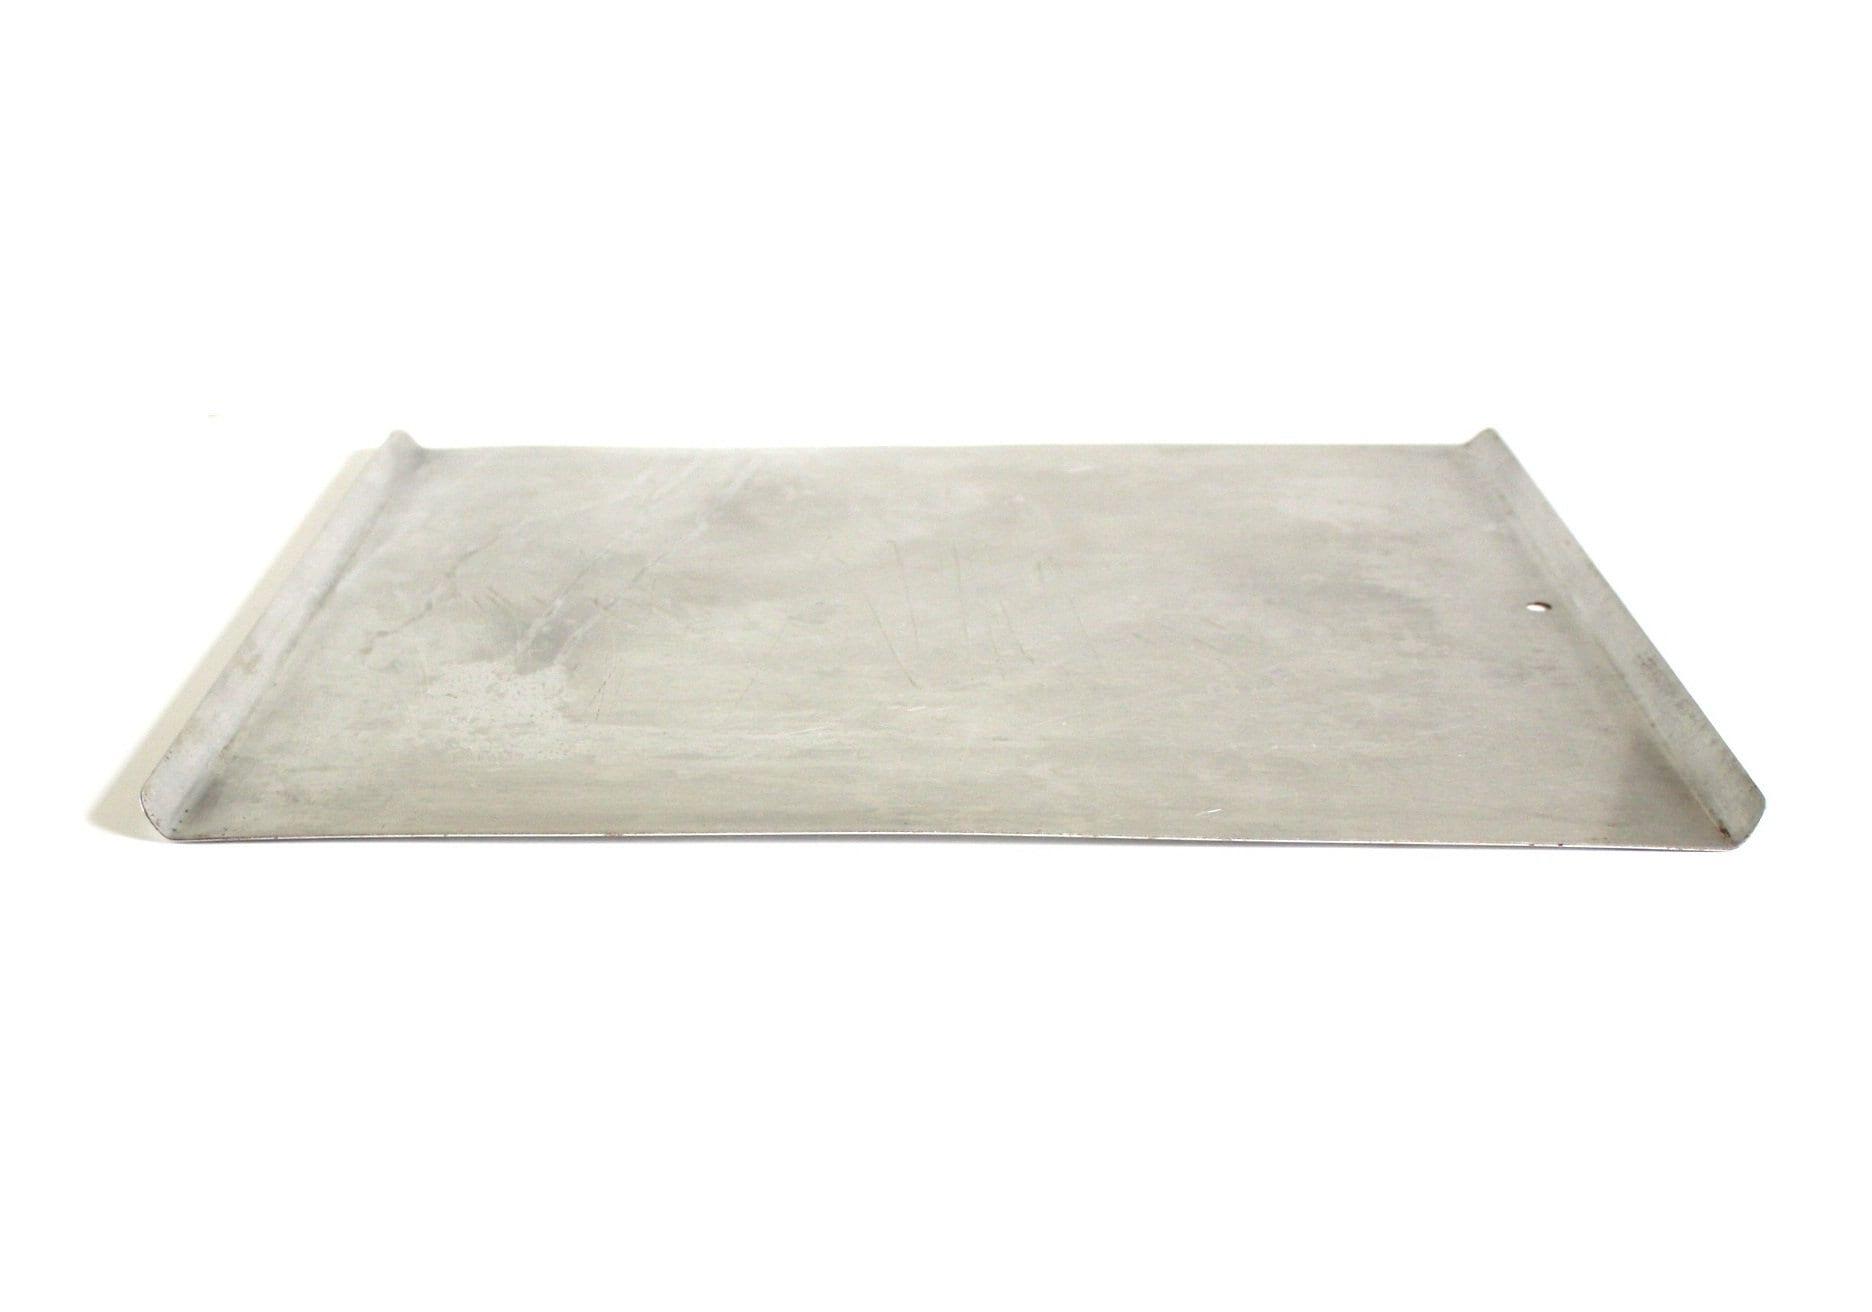 Mirro Cookie Sheet 5487M, Aluminum Pizza Pan 17 x 14\